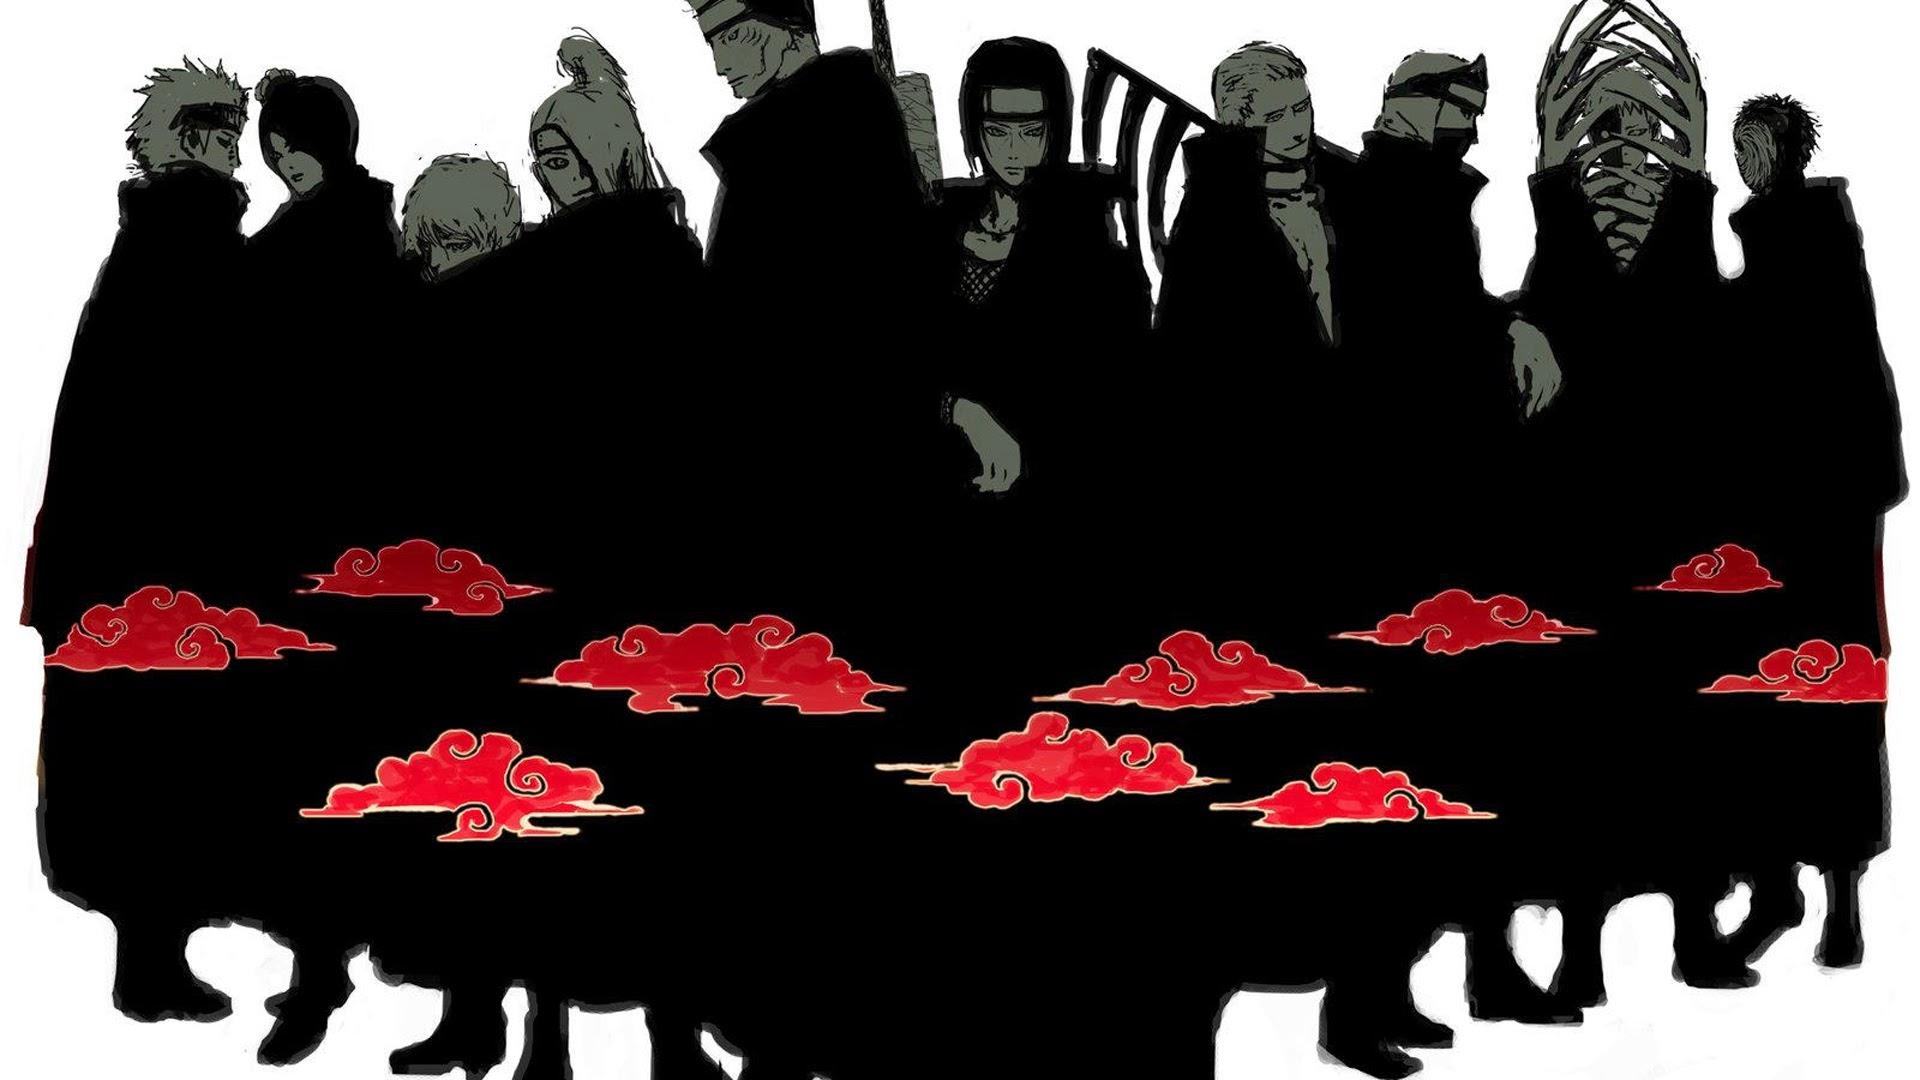 Akatsuki Group Member 0d Wallpaper HD 1920x1080